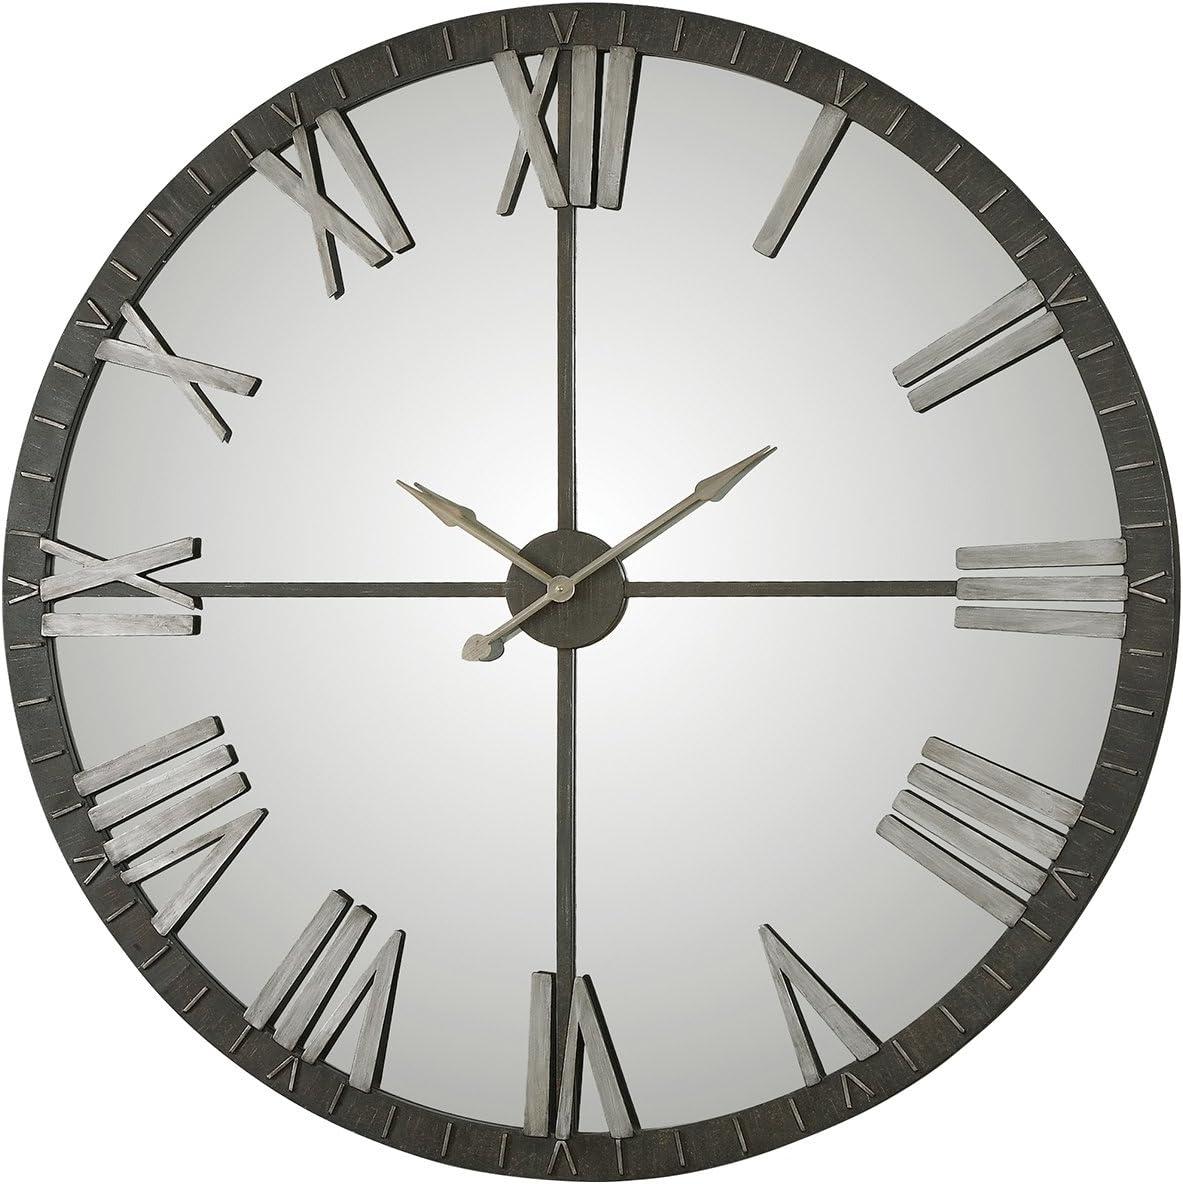 Uttermost 06419 Amelie Bronze Wall Clock, Large